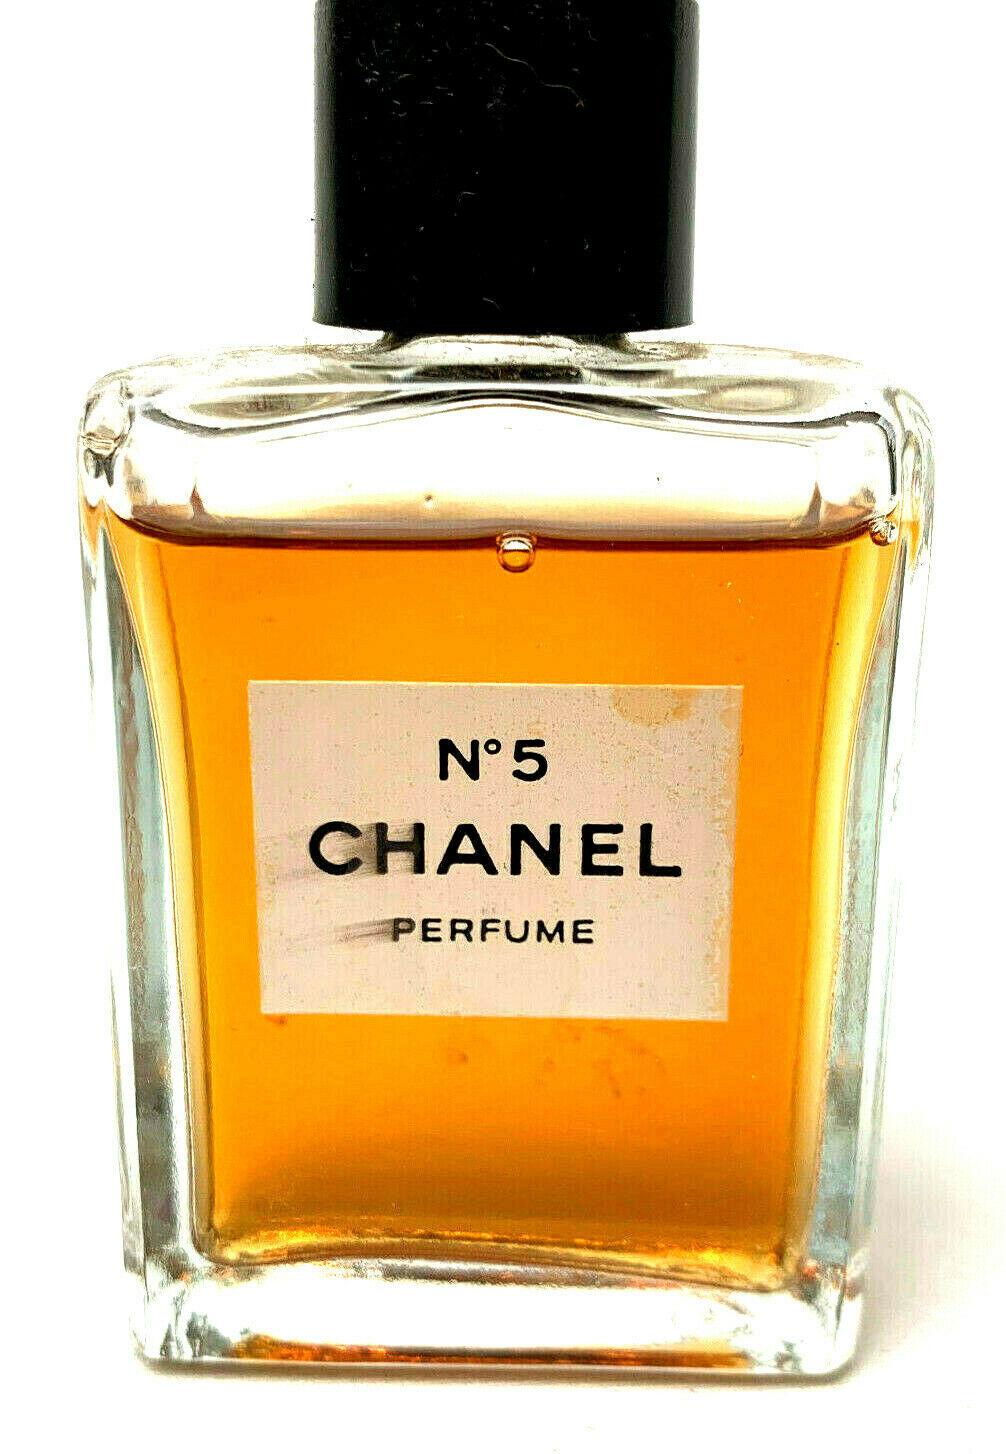 Chanel No. 5 Perfume 1 Fl oz 30ML Doubled Boxed - $183.15